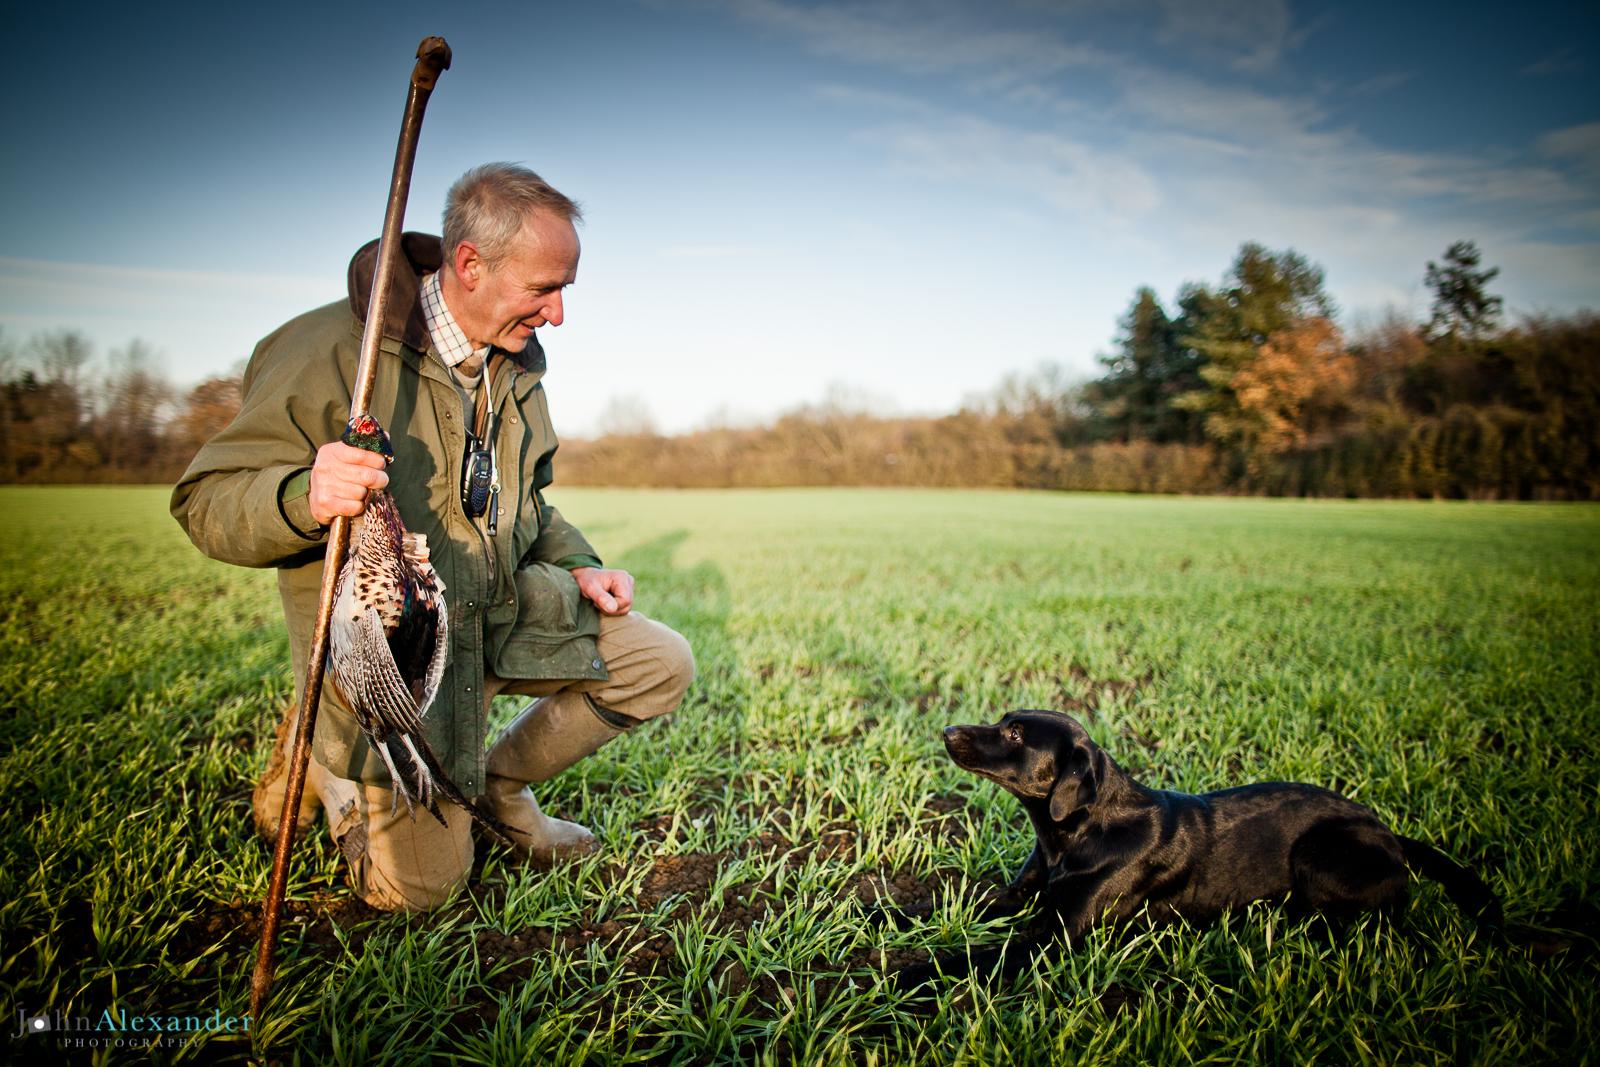 gun looking at black labrador gun dog with pheasant in hand